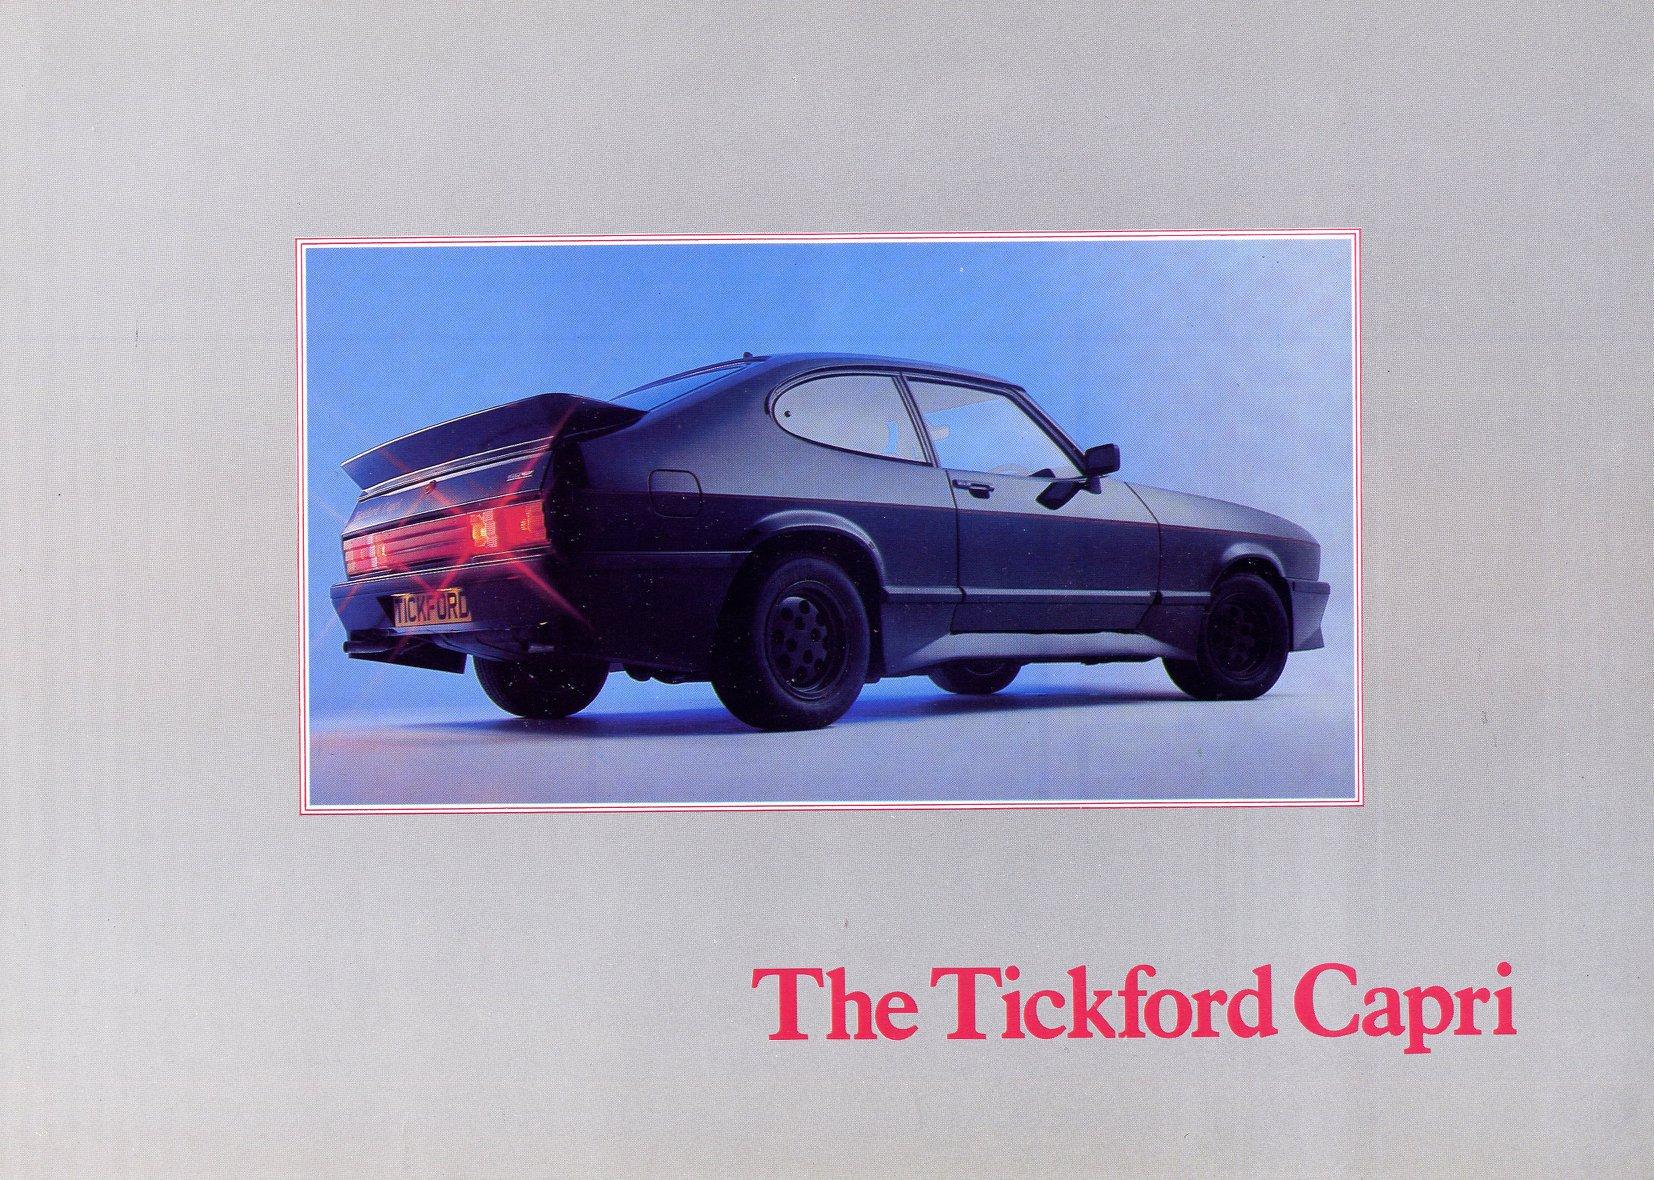 Tickford-brosjyre-1